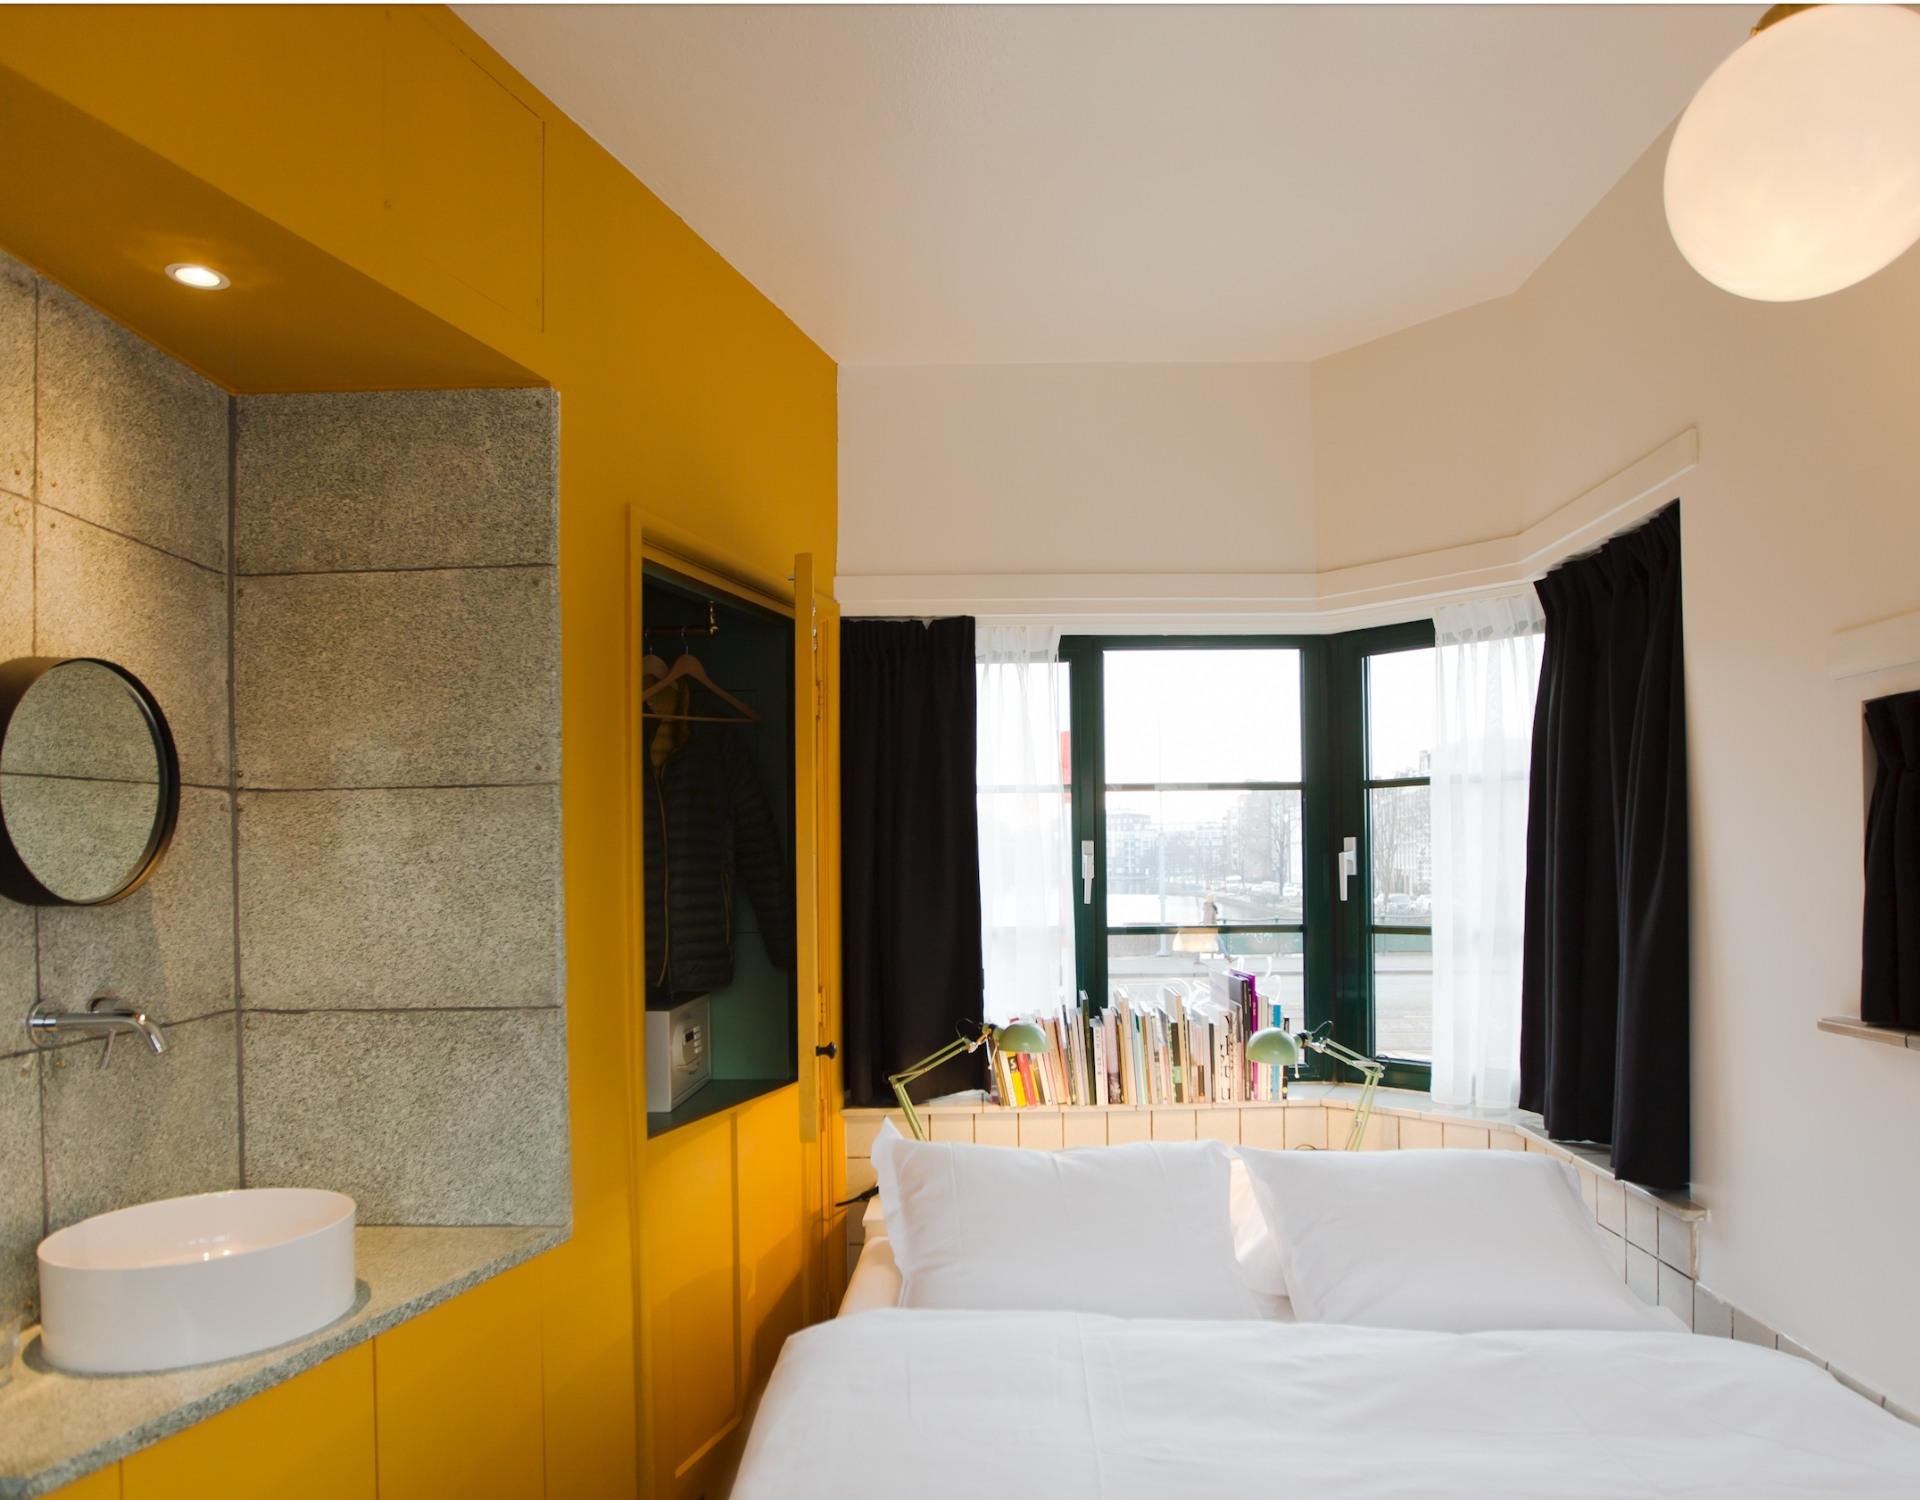 tiny hotel room on a bridge amsterdam sweets hotel